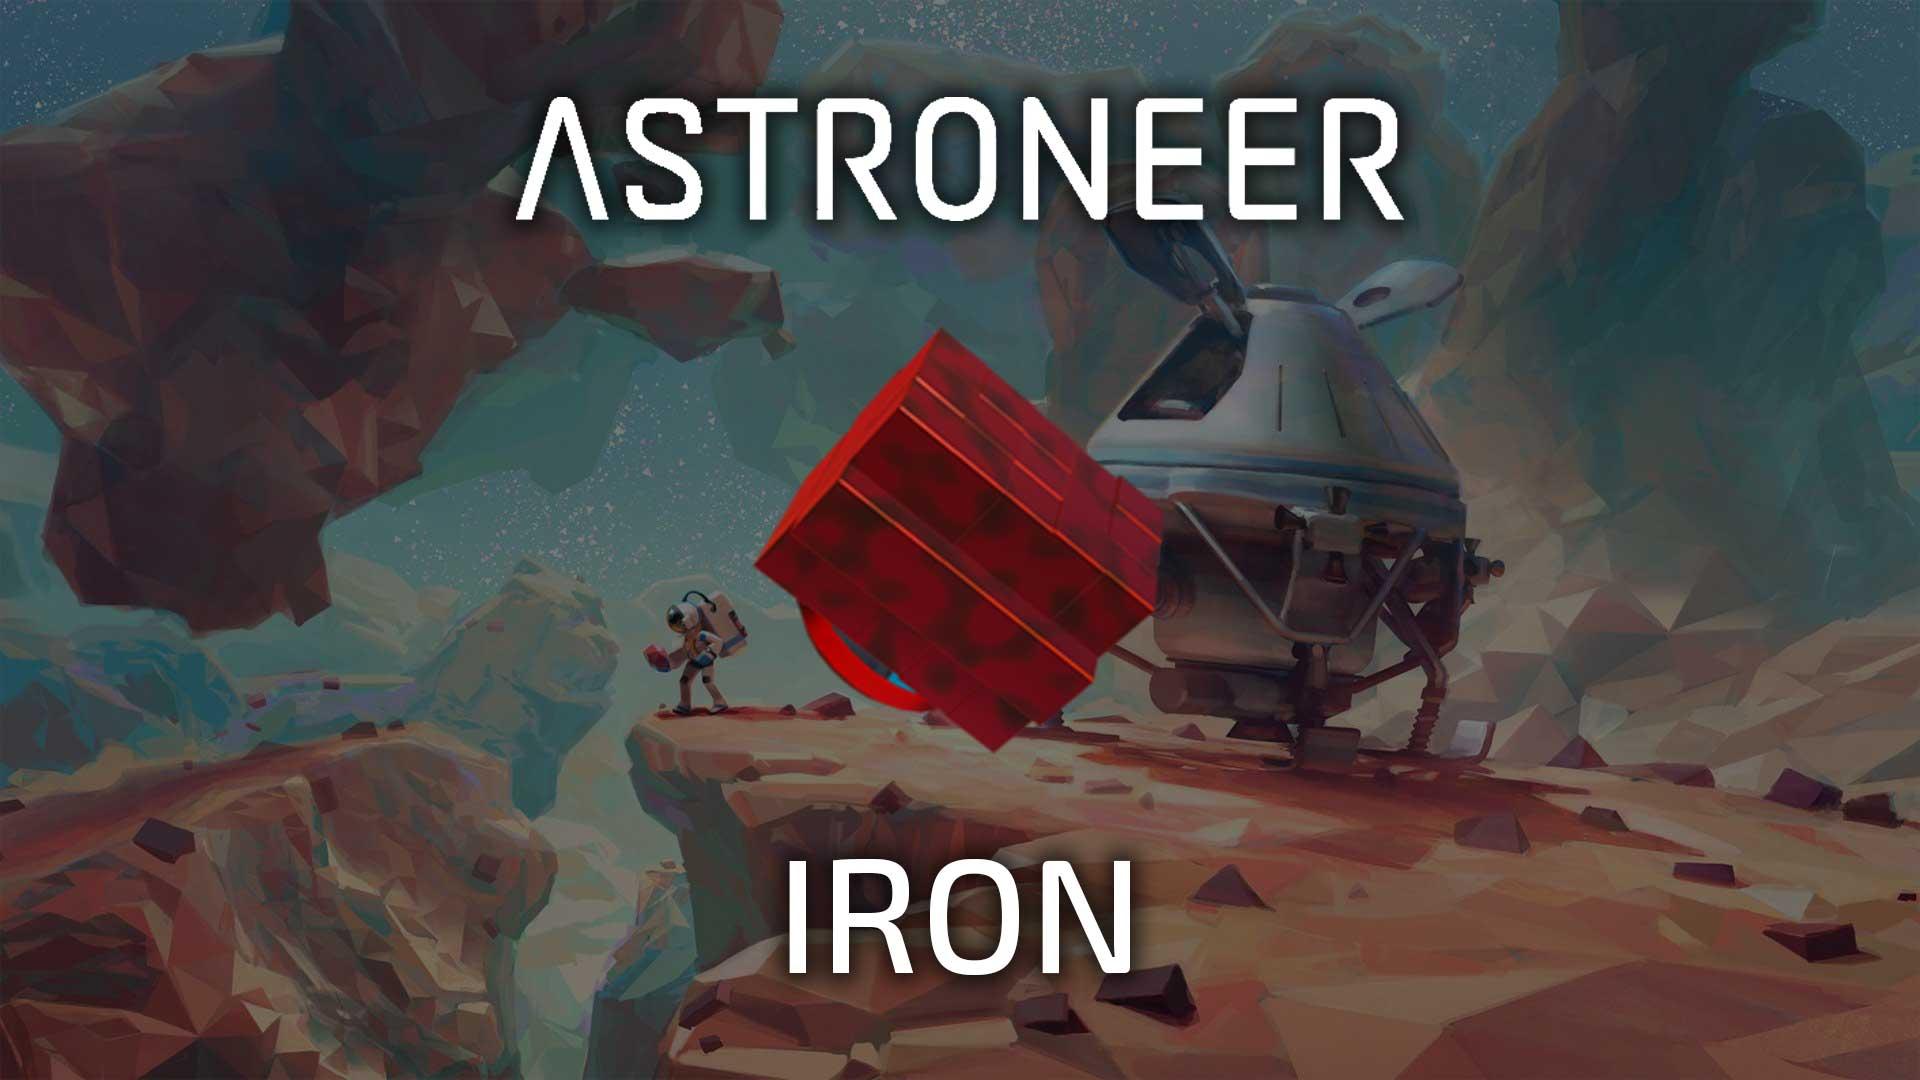 astroneer iron